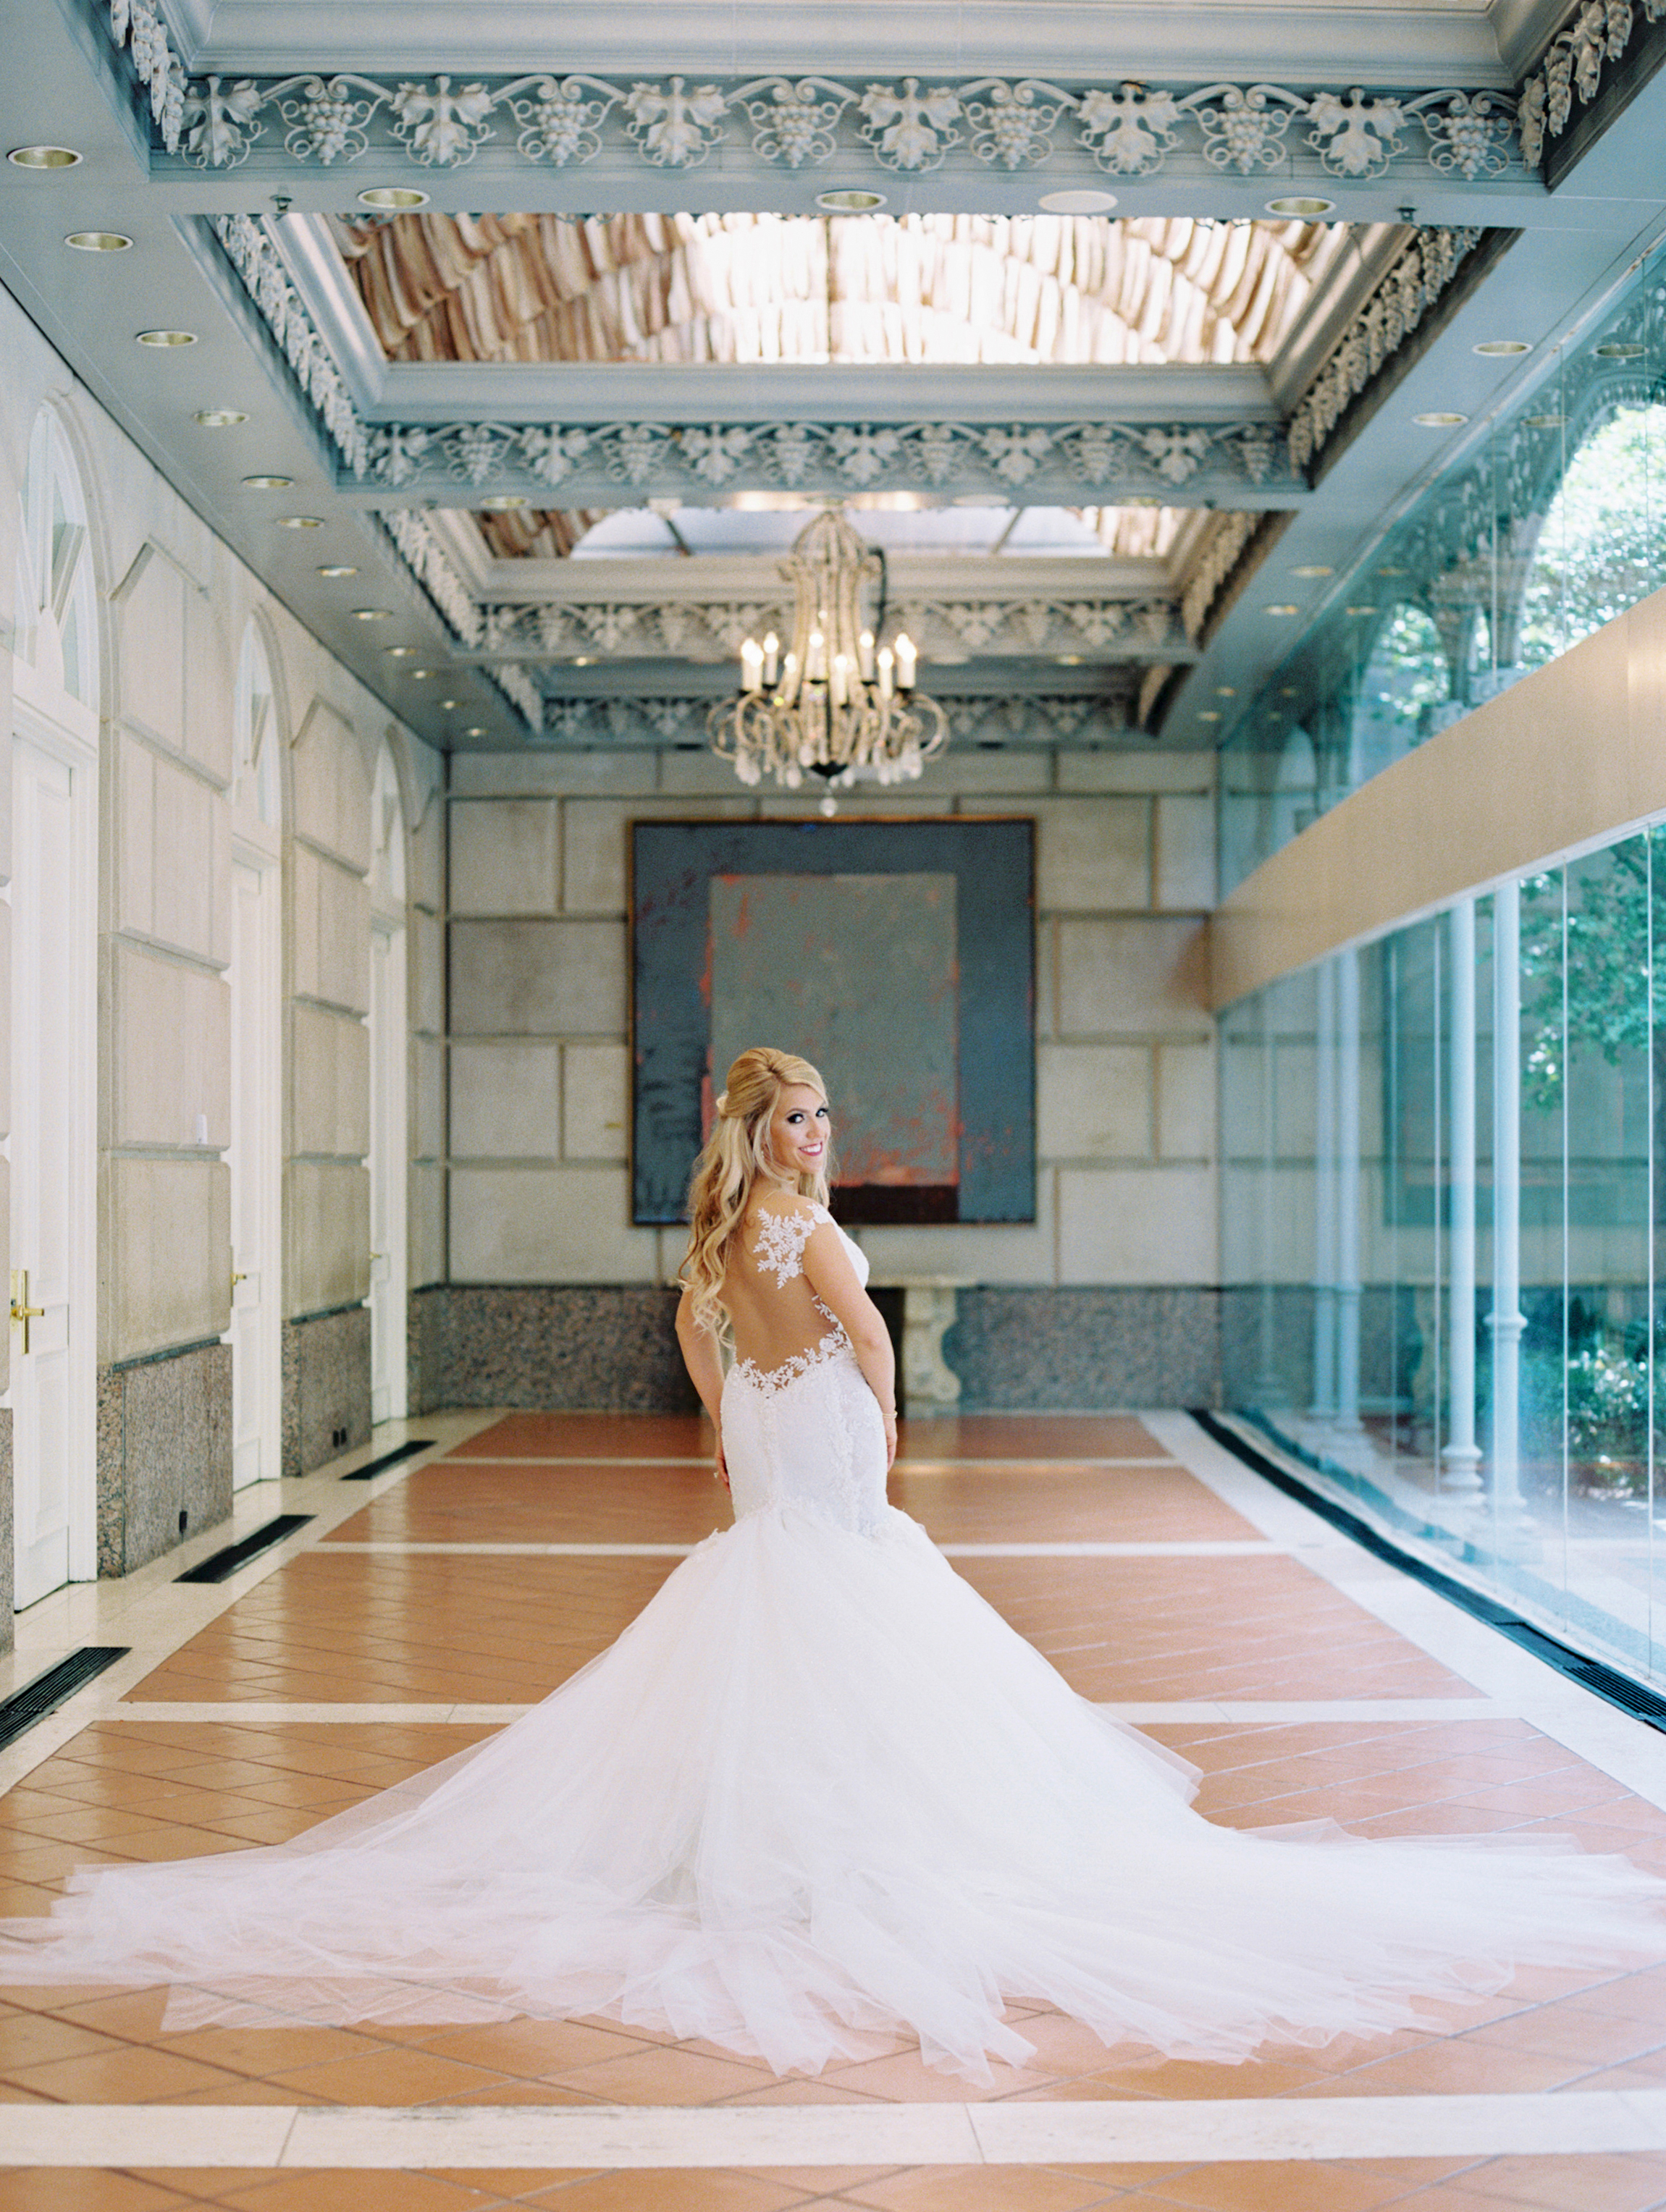 Blakeley-in-wedding-dress-Ivory-and-Vine.JPG